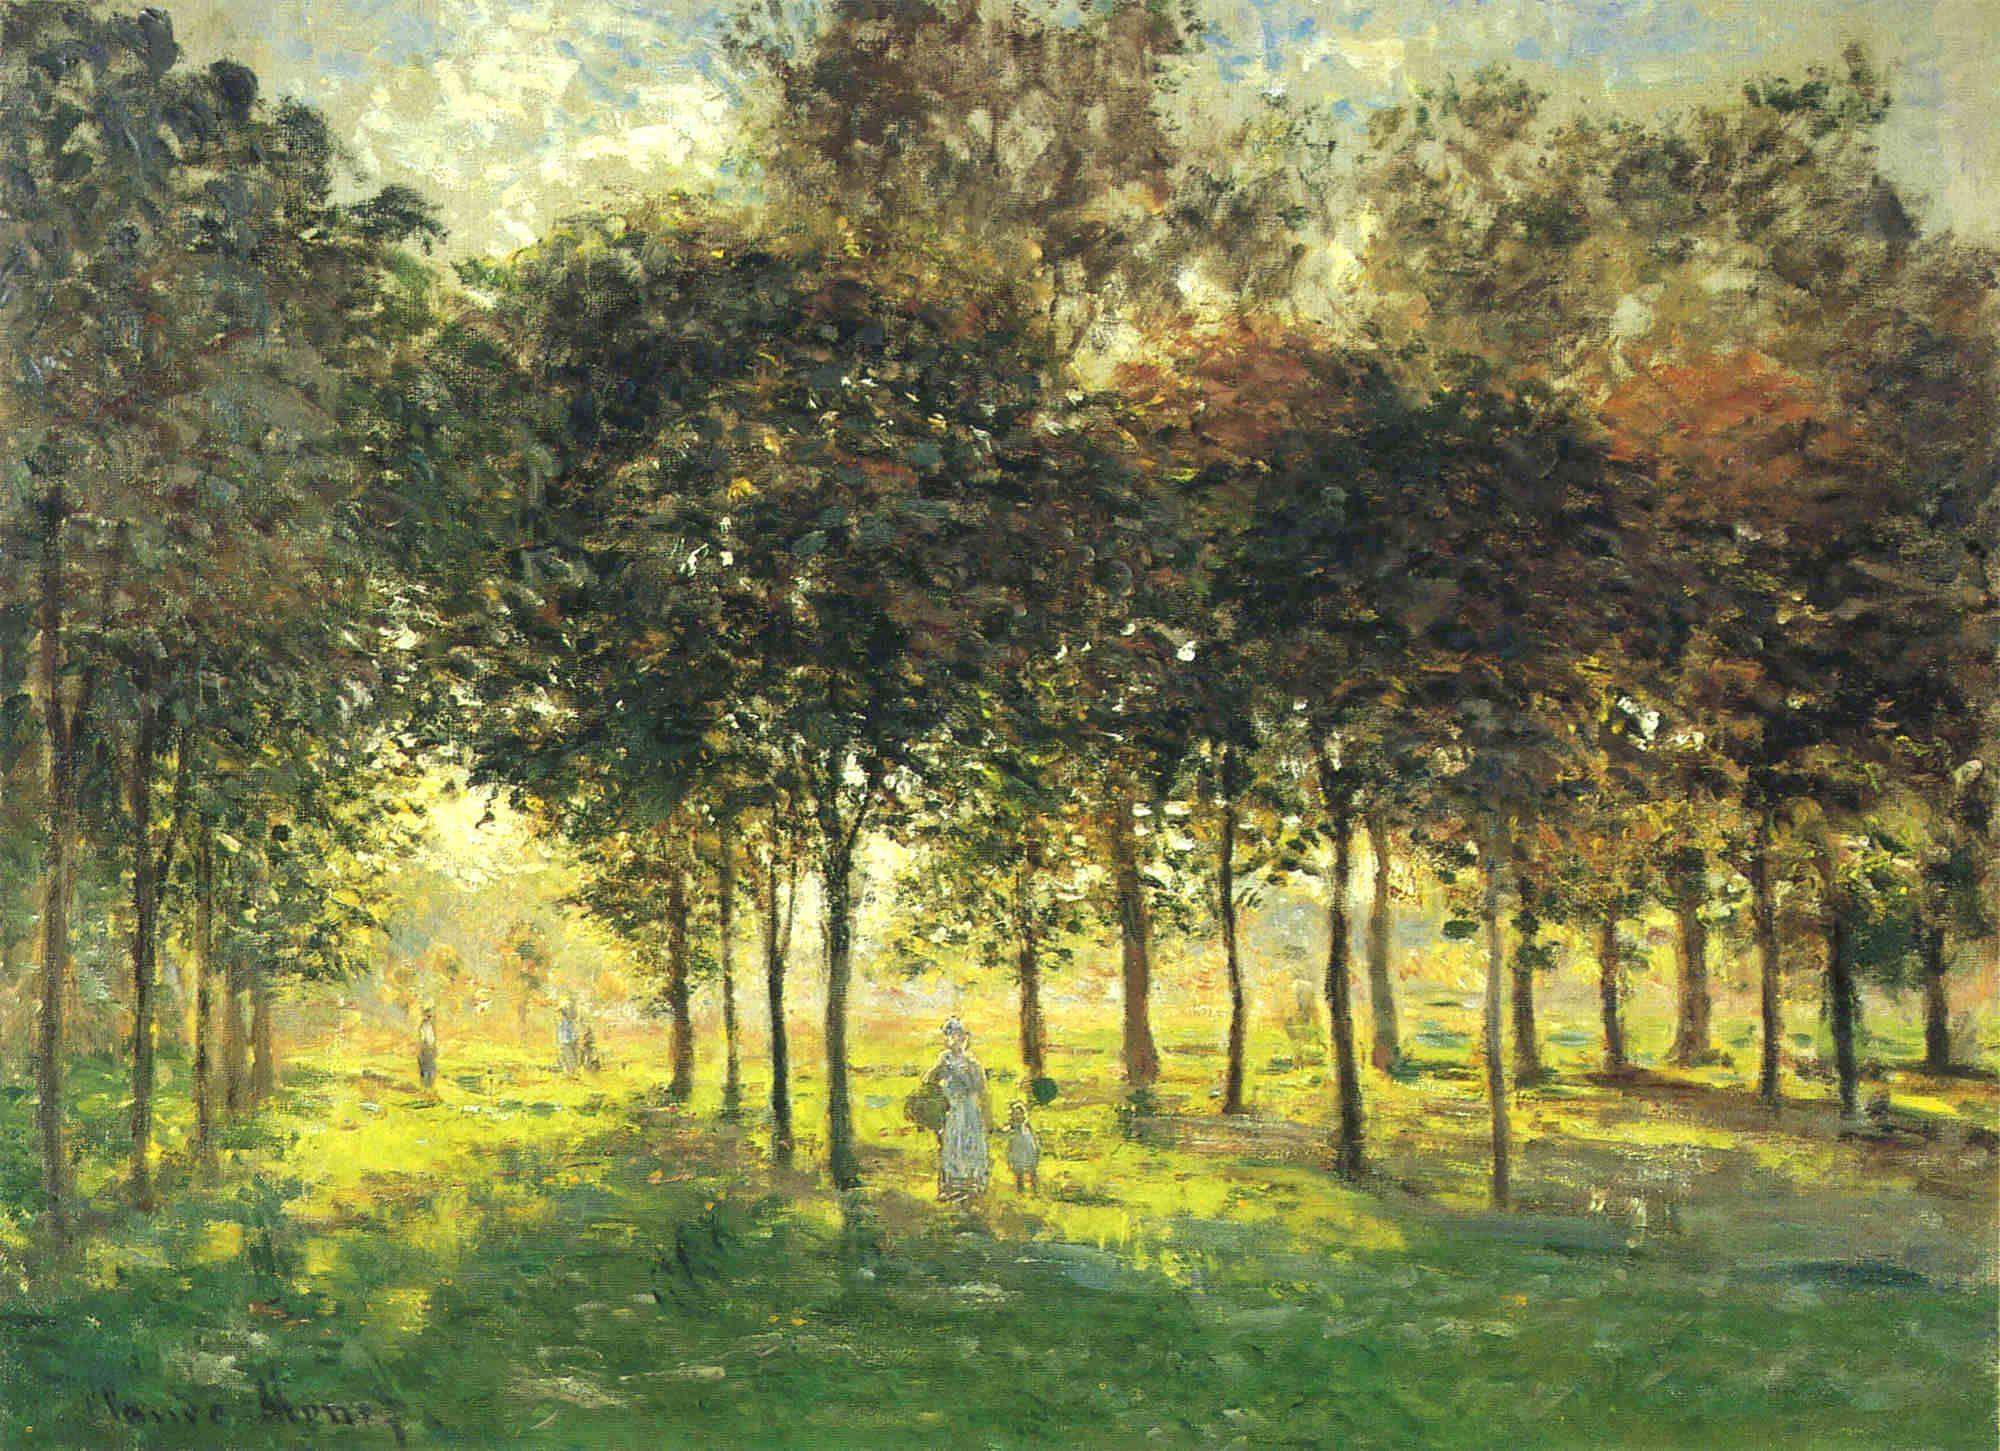 Claude Monet | Monet art, Claude monet, Artist monet